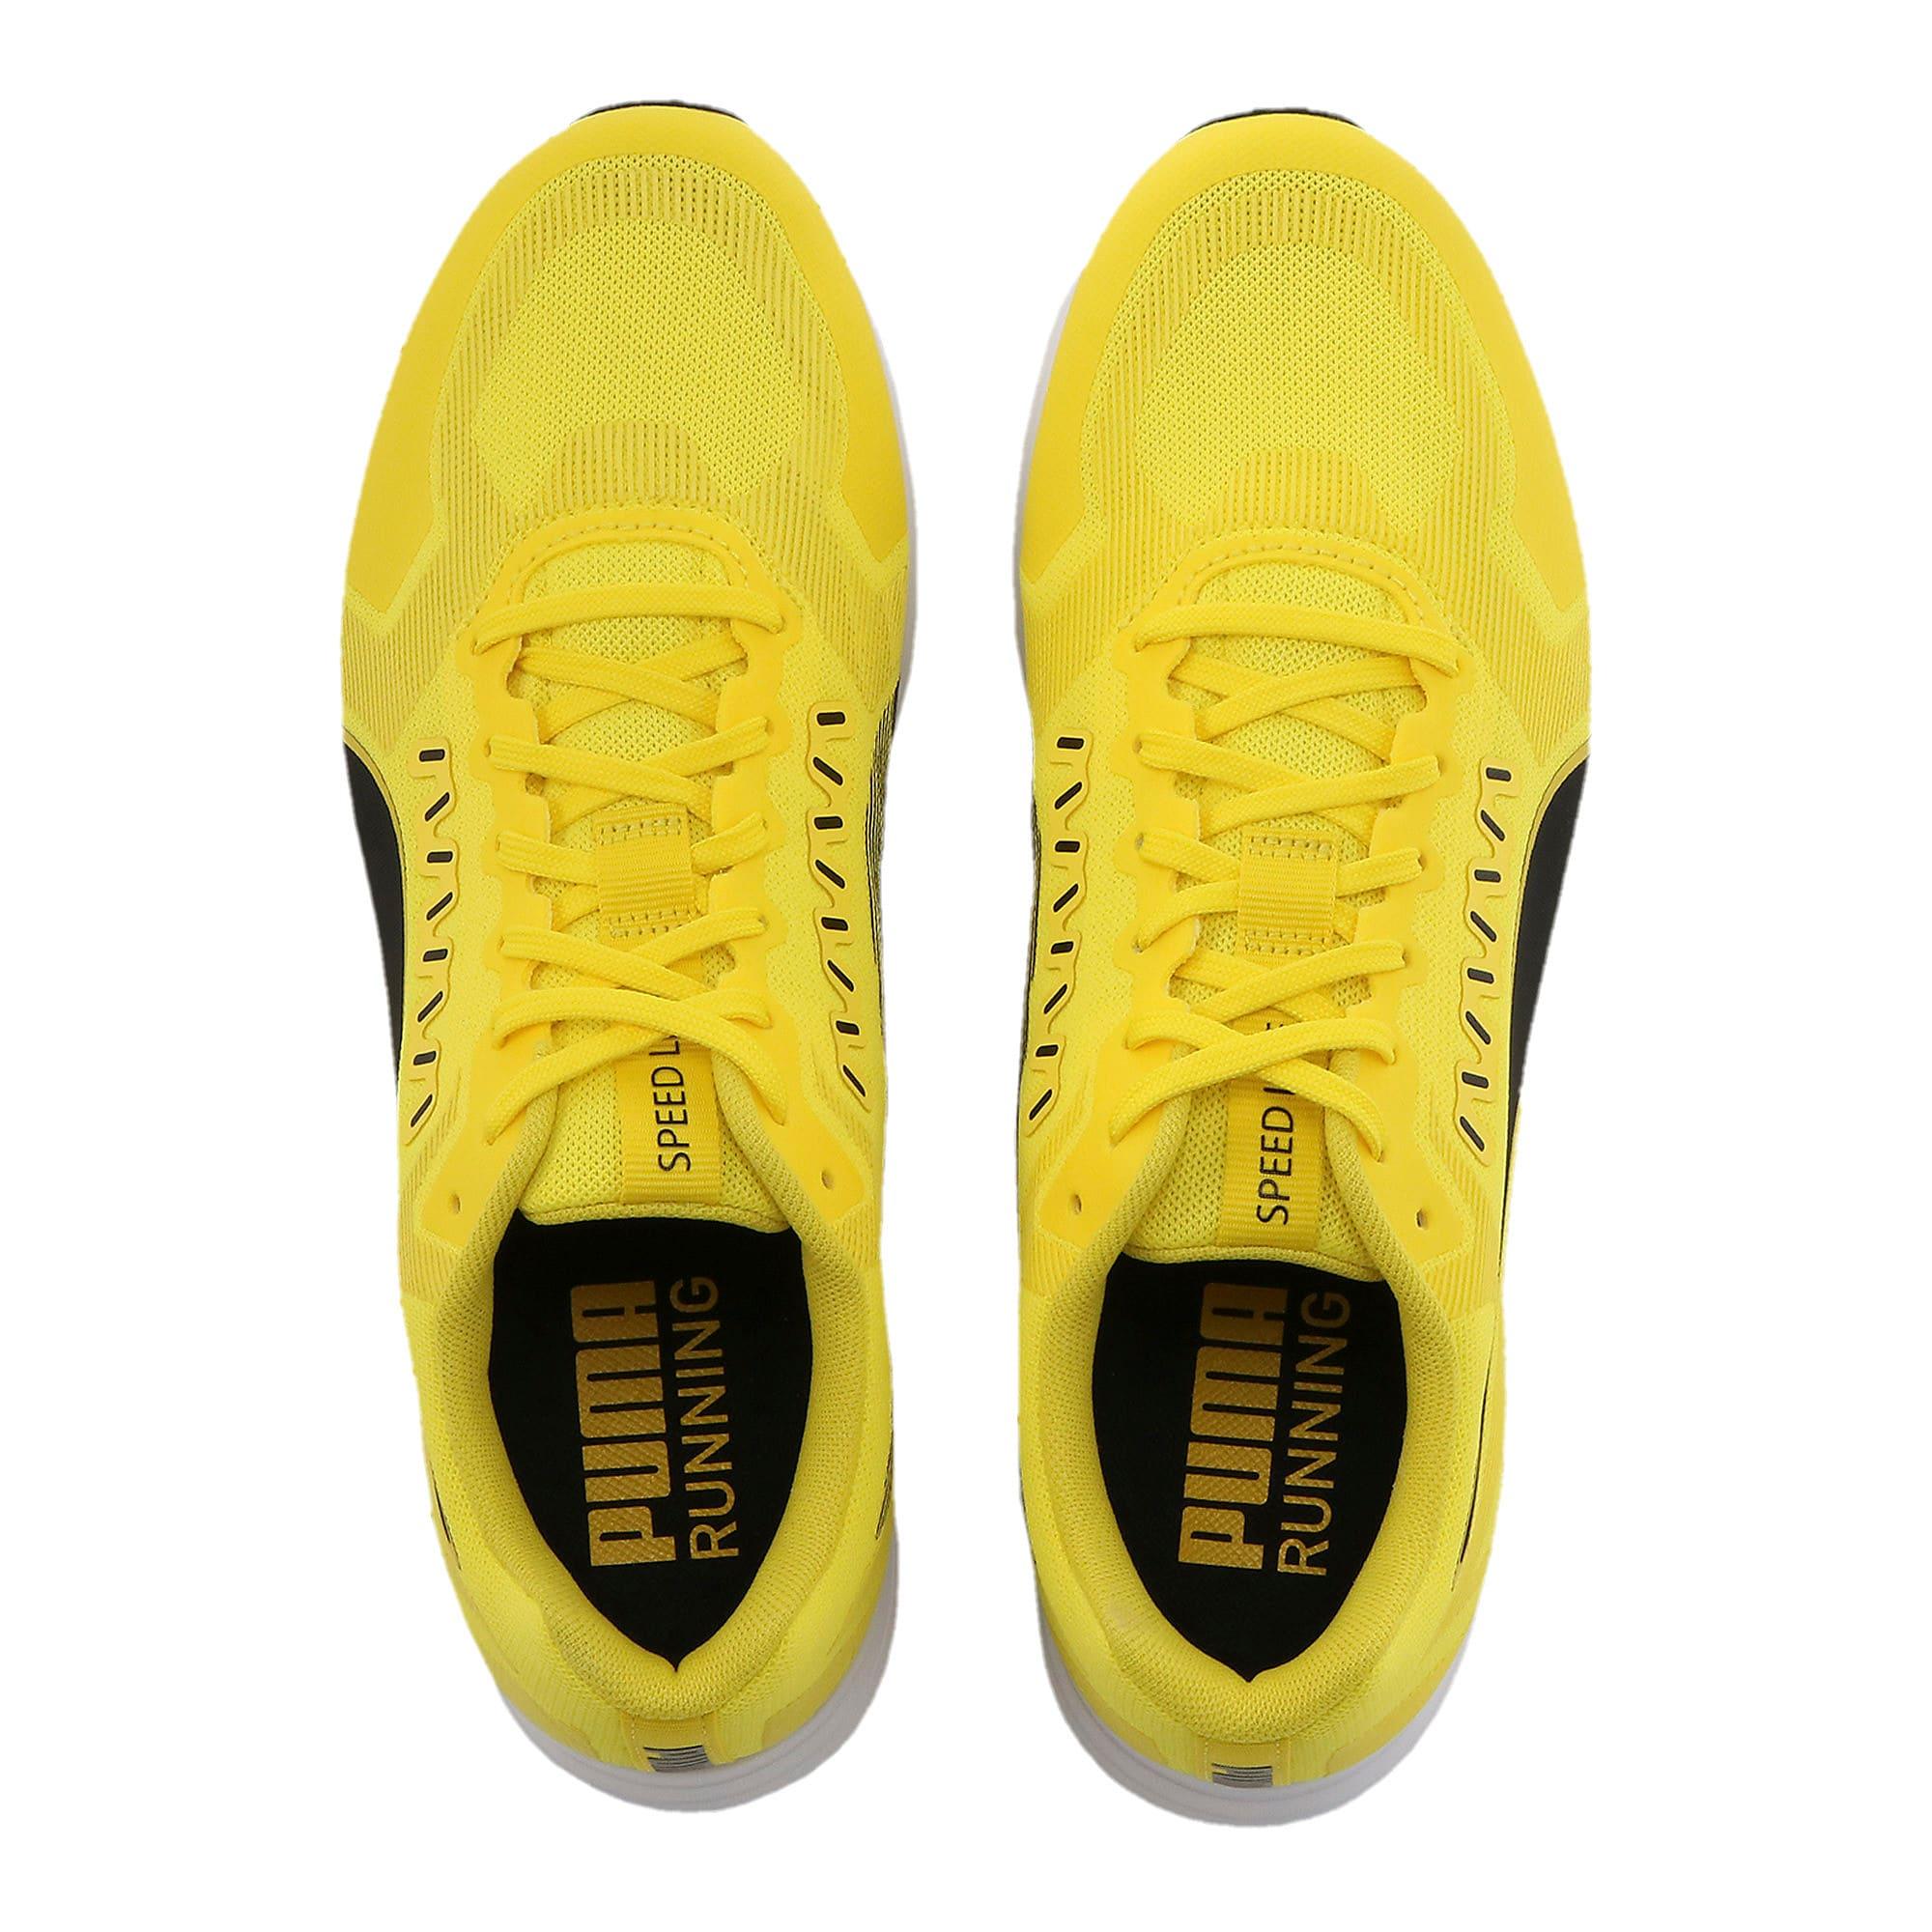 Thumbnail 6 of スピード ライト 2 ランニング, Blazing Yellow-Puma Black, medium-JPN